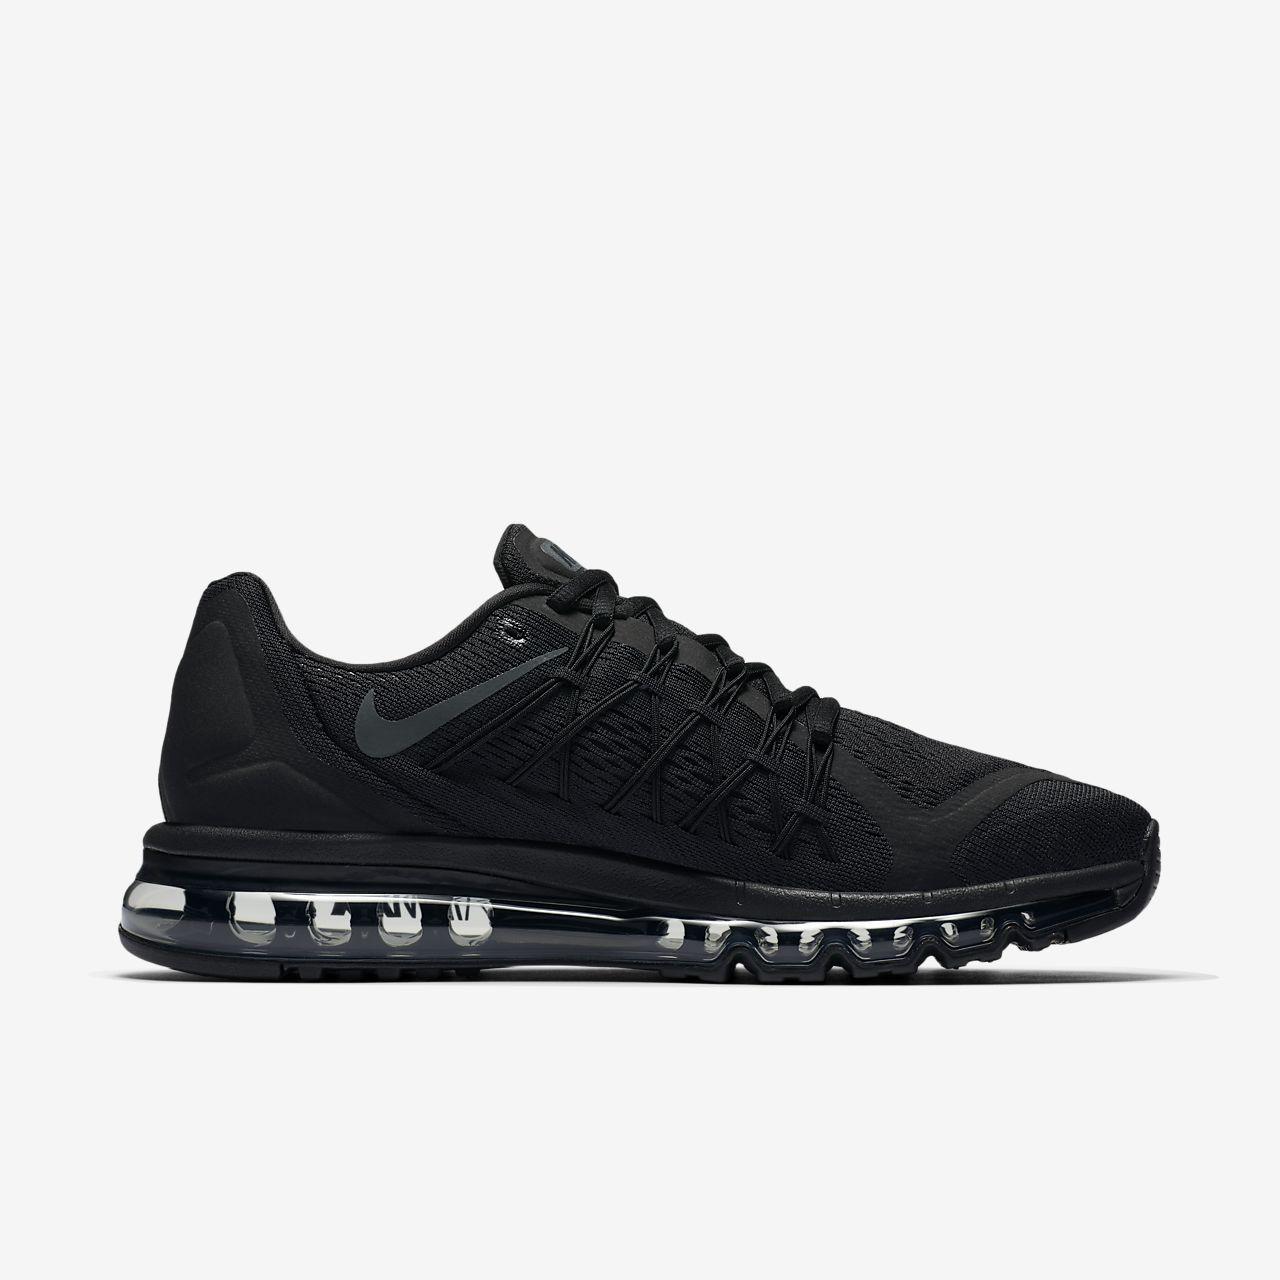 acheter populaire b8578 73426 Nike Air Max 2015 Men's Shoe